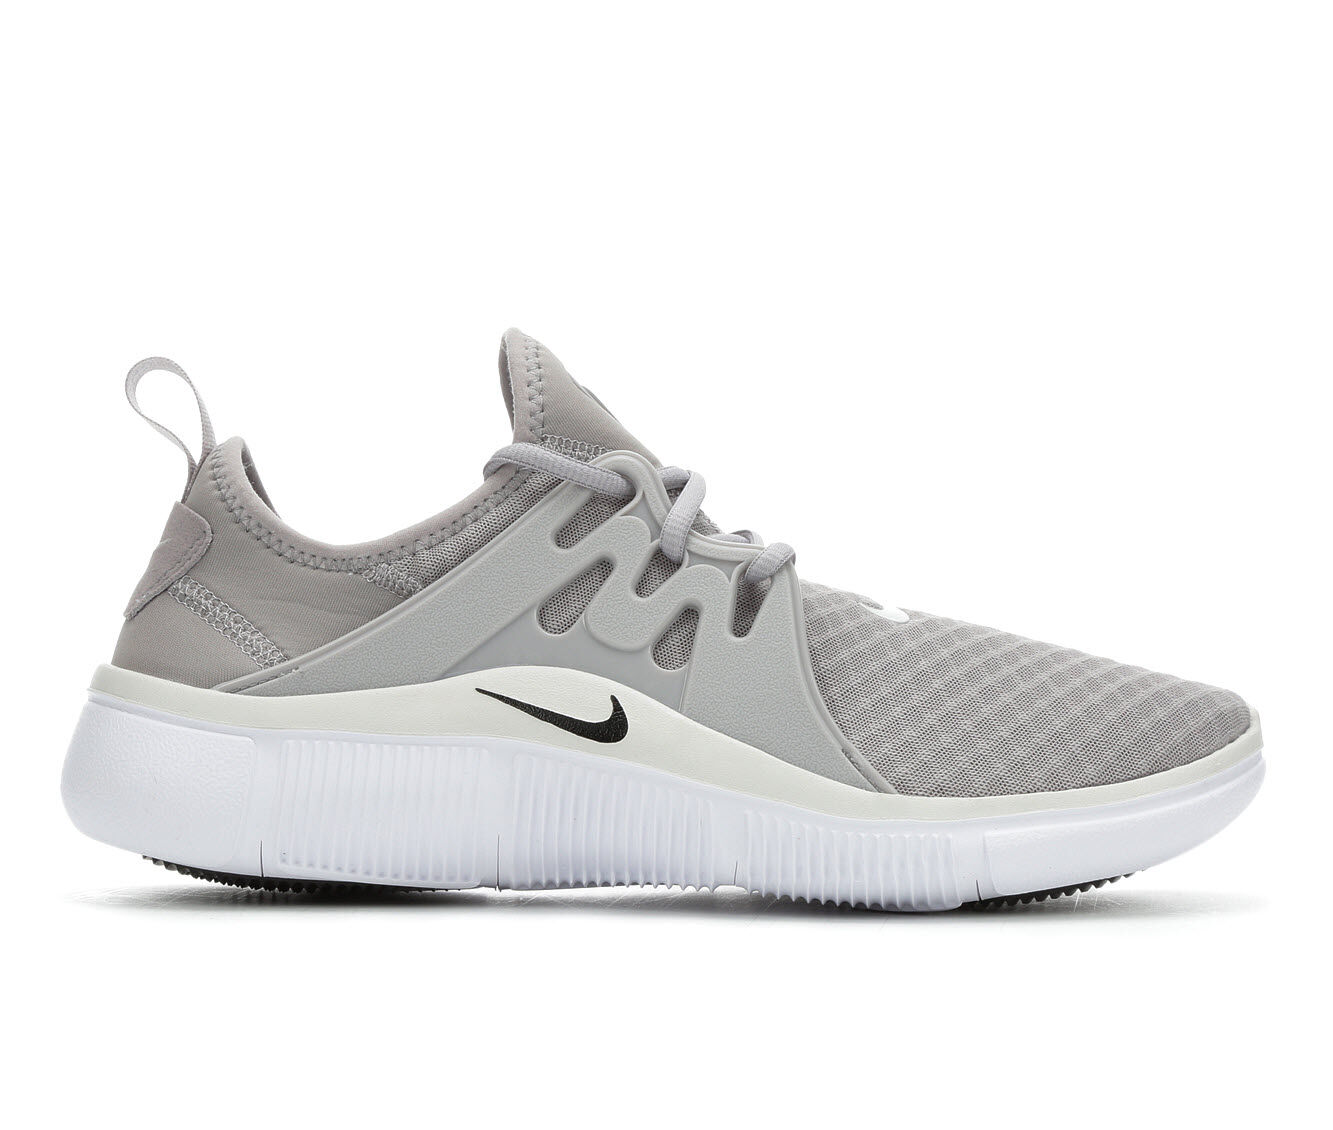 uk shoes_kd1031